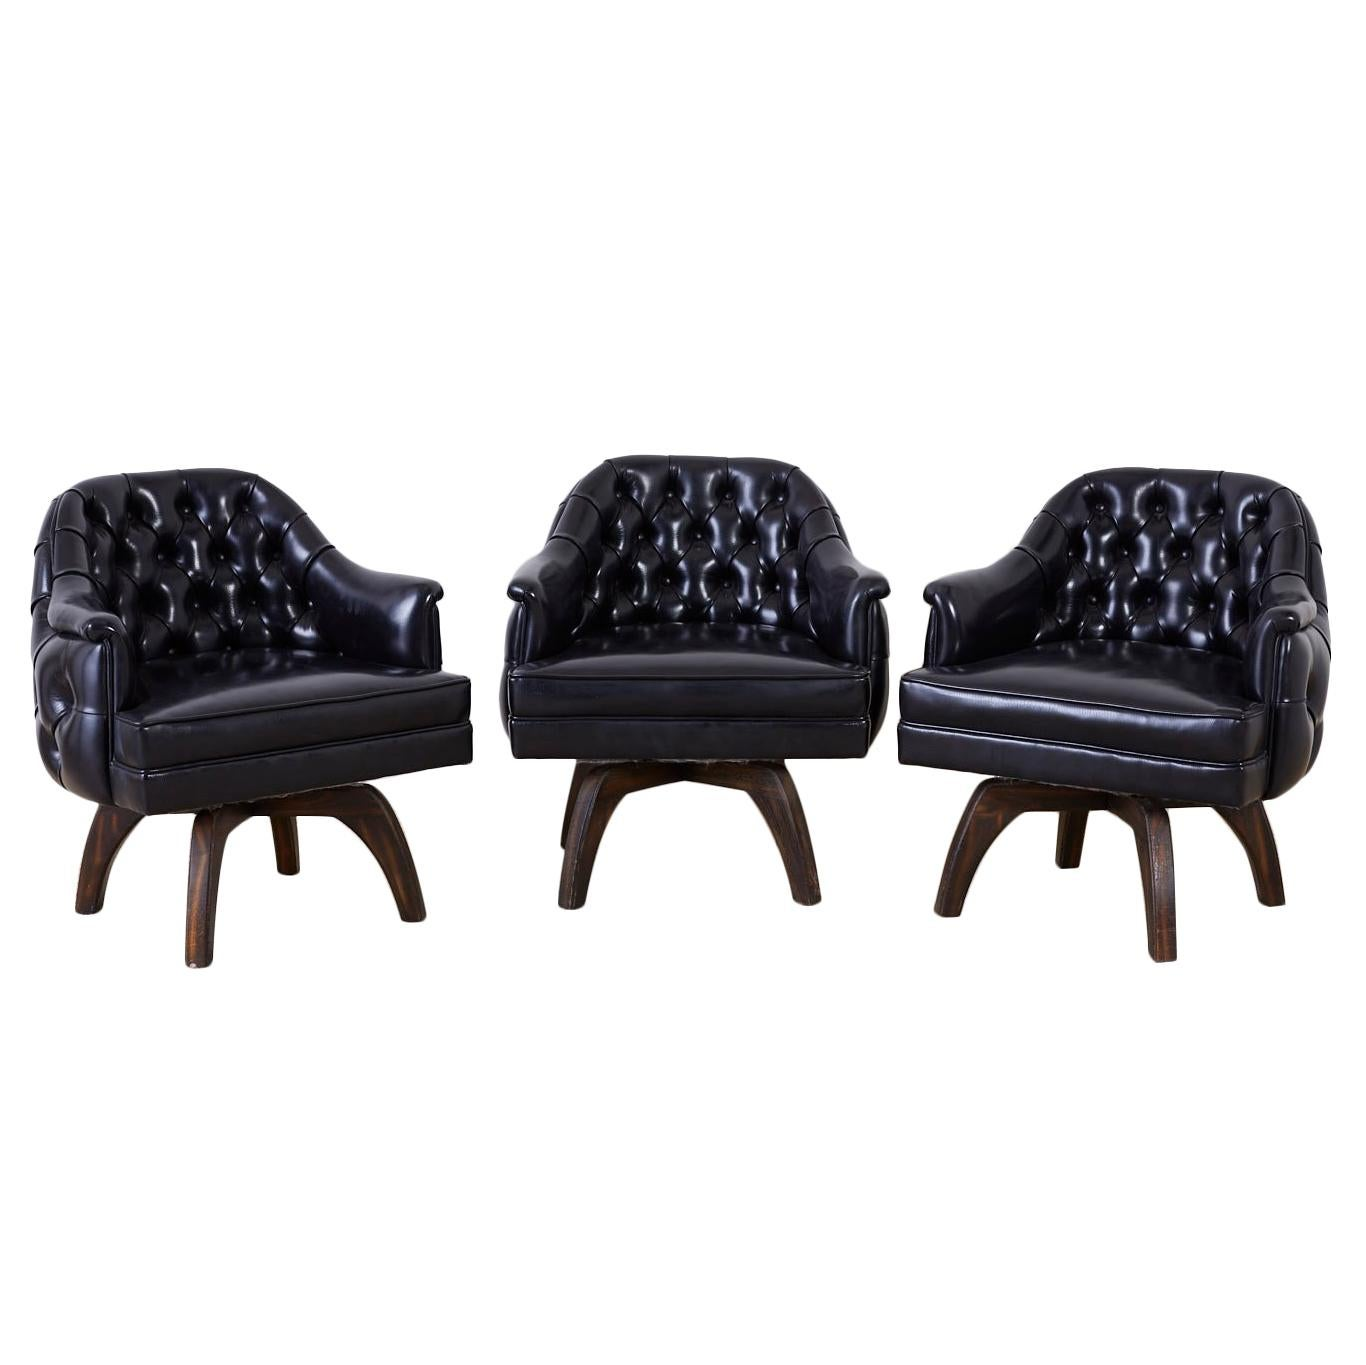 Set of Three Mid Century Tufted Black Leatherette Club Chairs